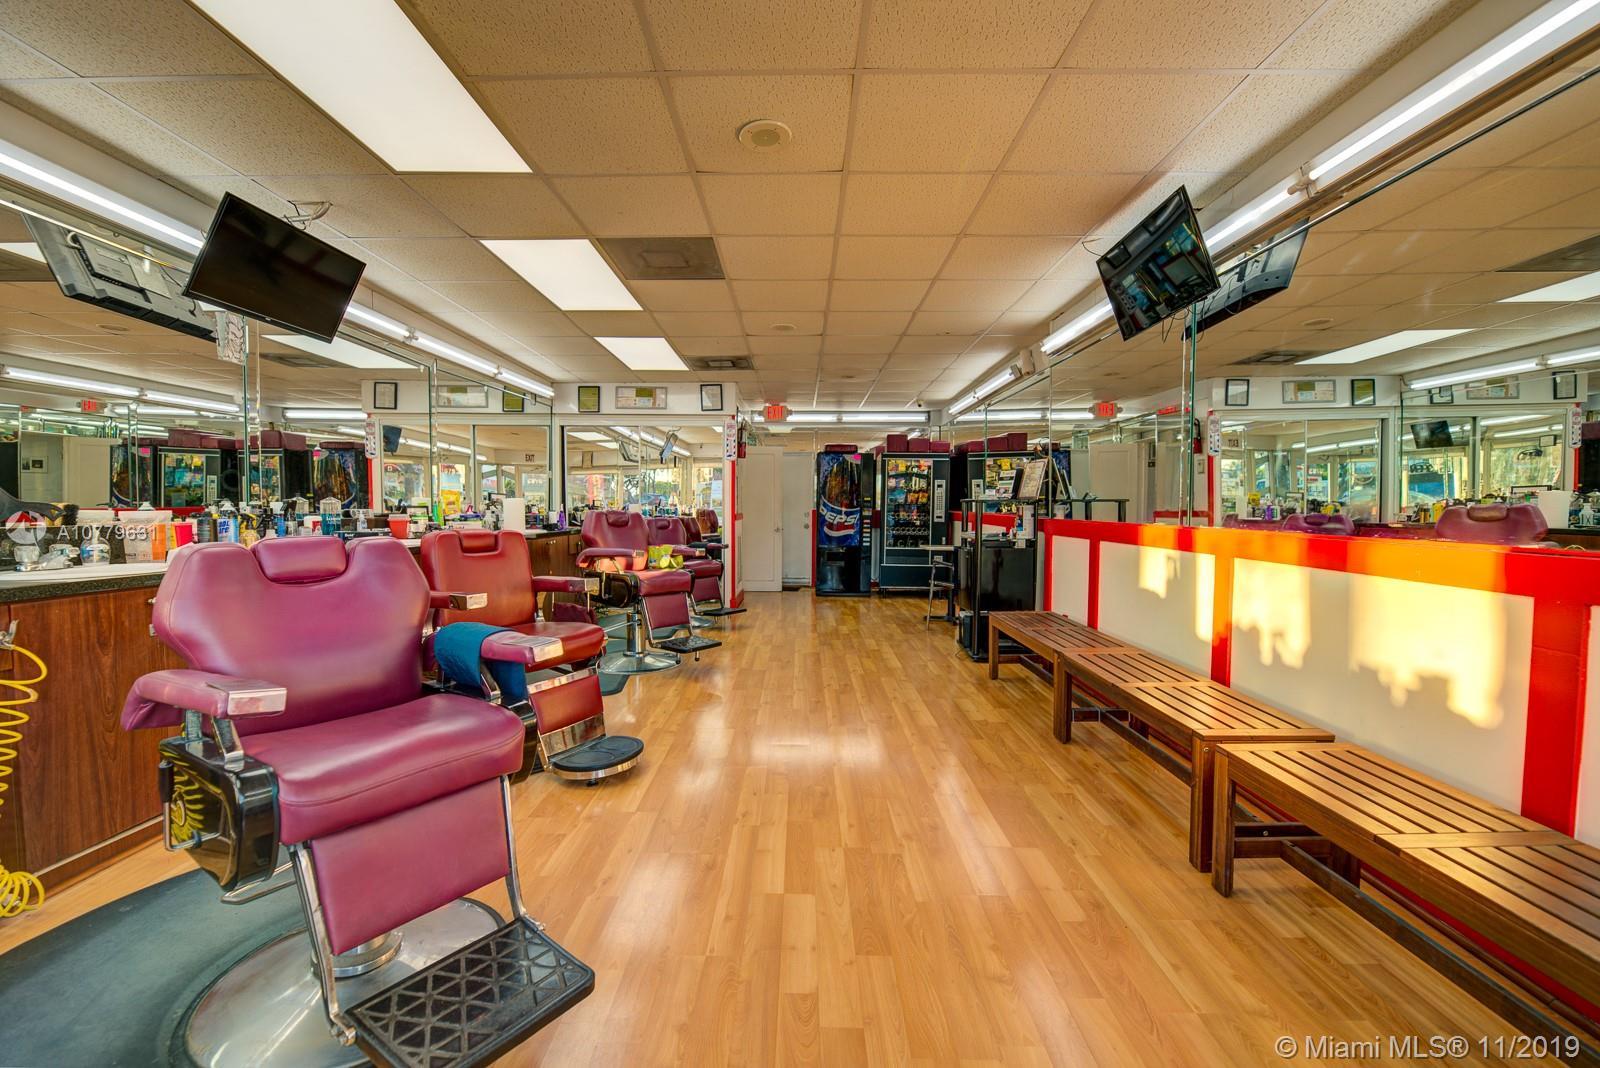 Barbershop By Westmiami, Miami, FL 33144